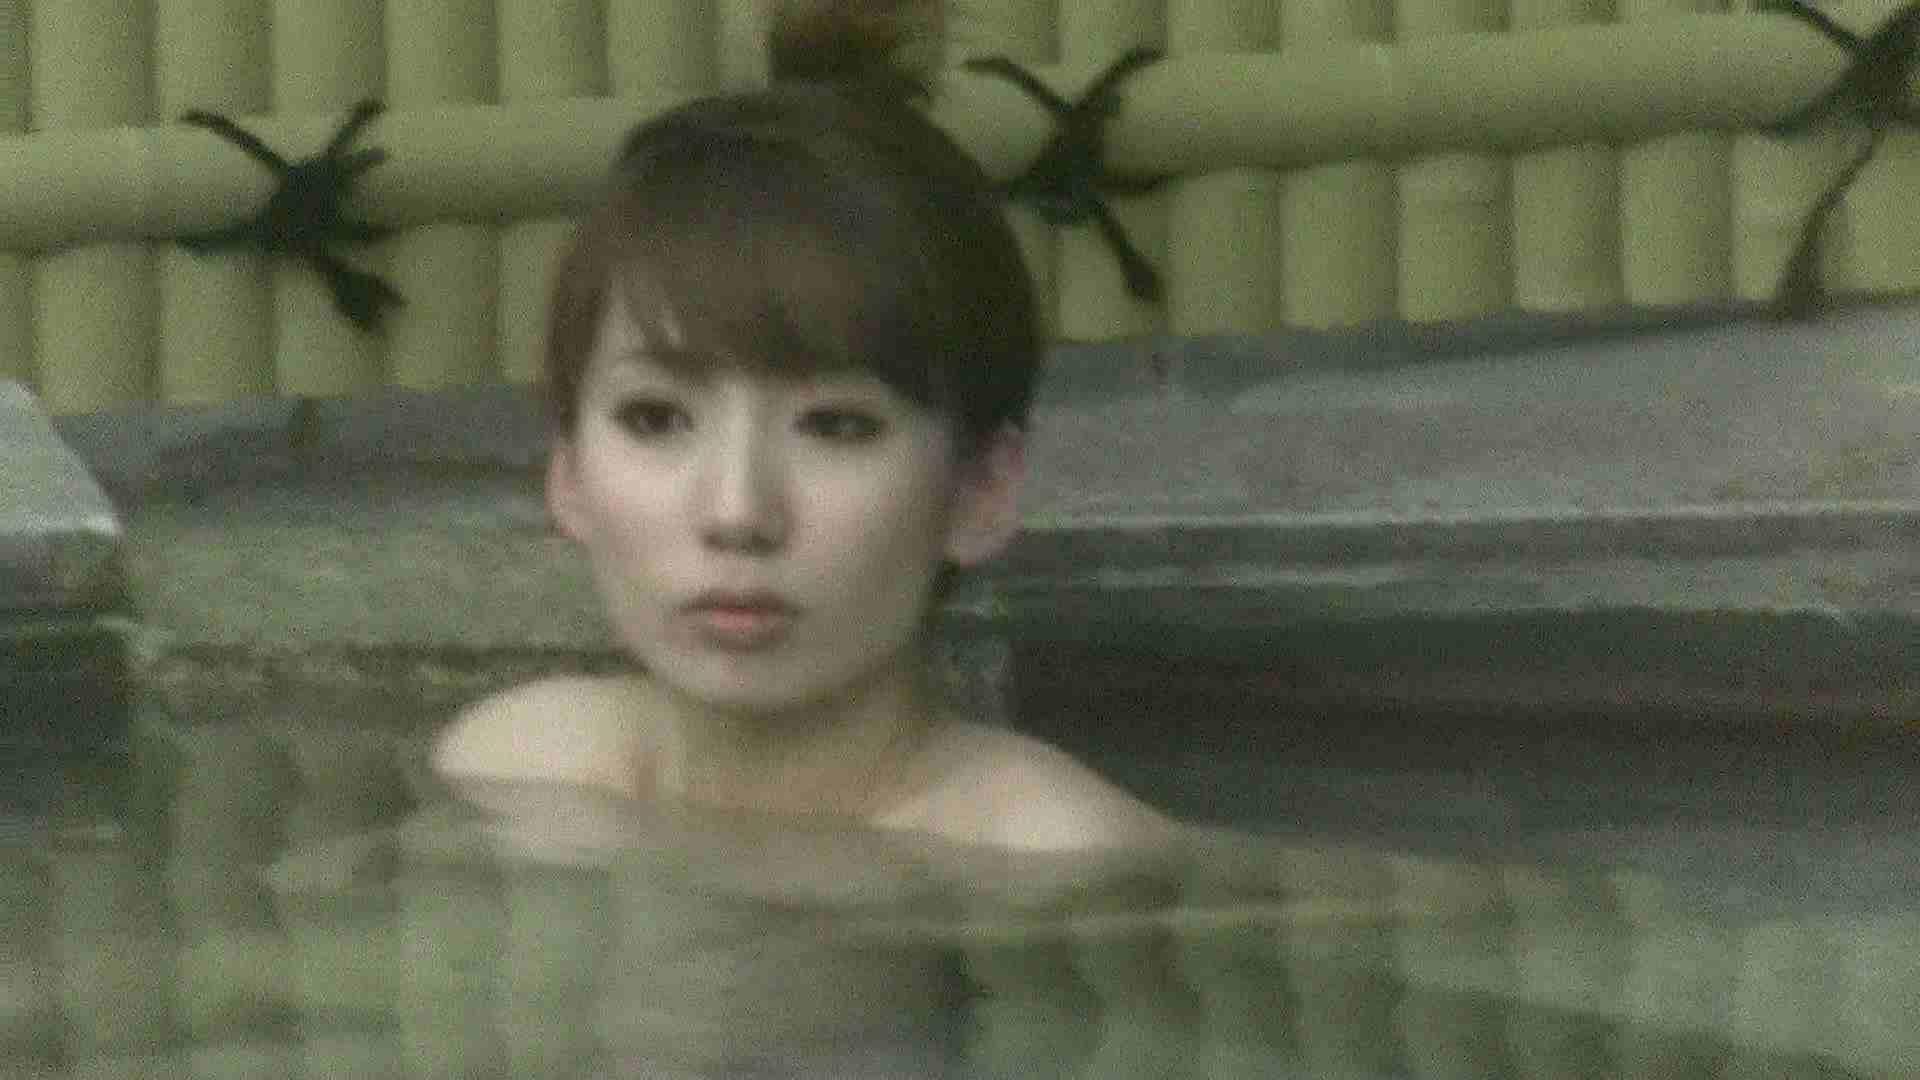 Aquaな露天風呂Vol.208 OLセックス  85画像 33